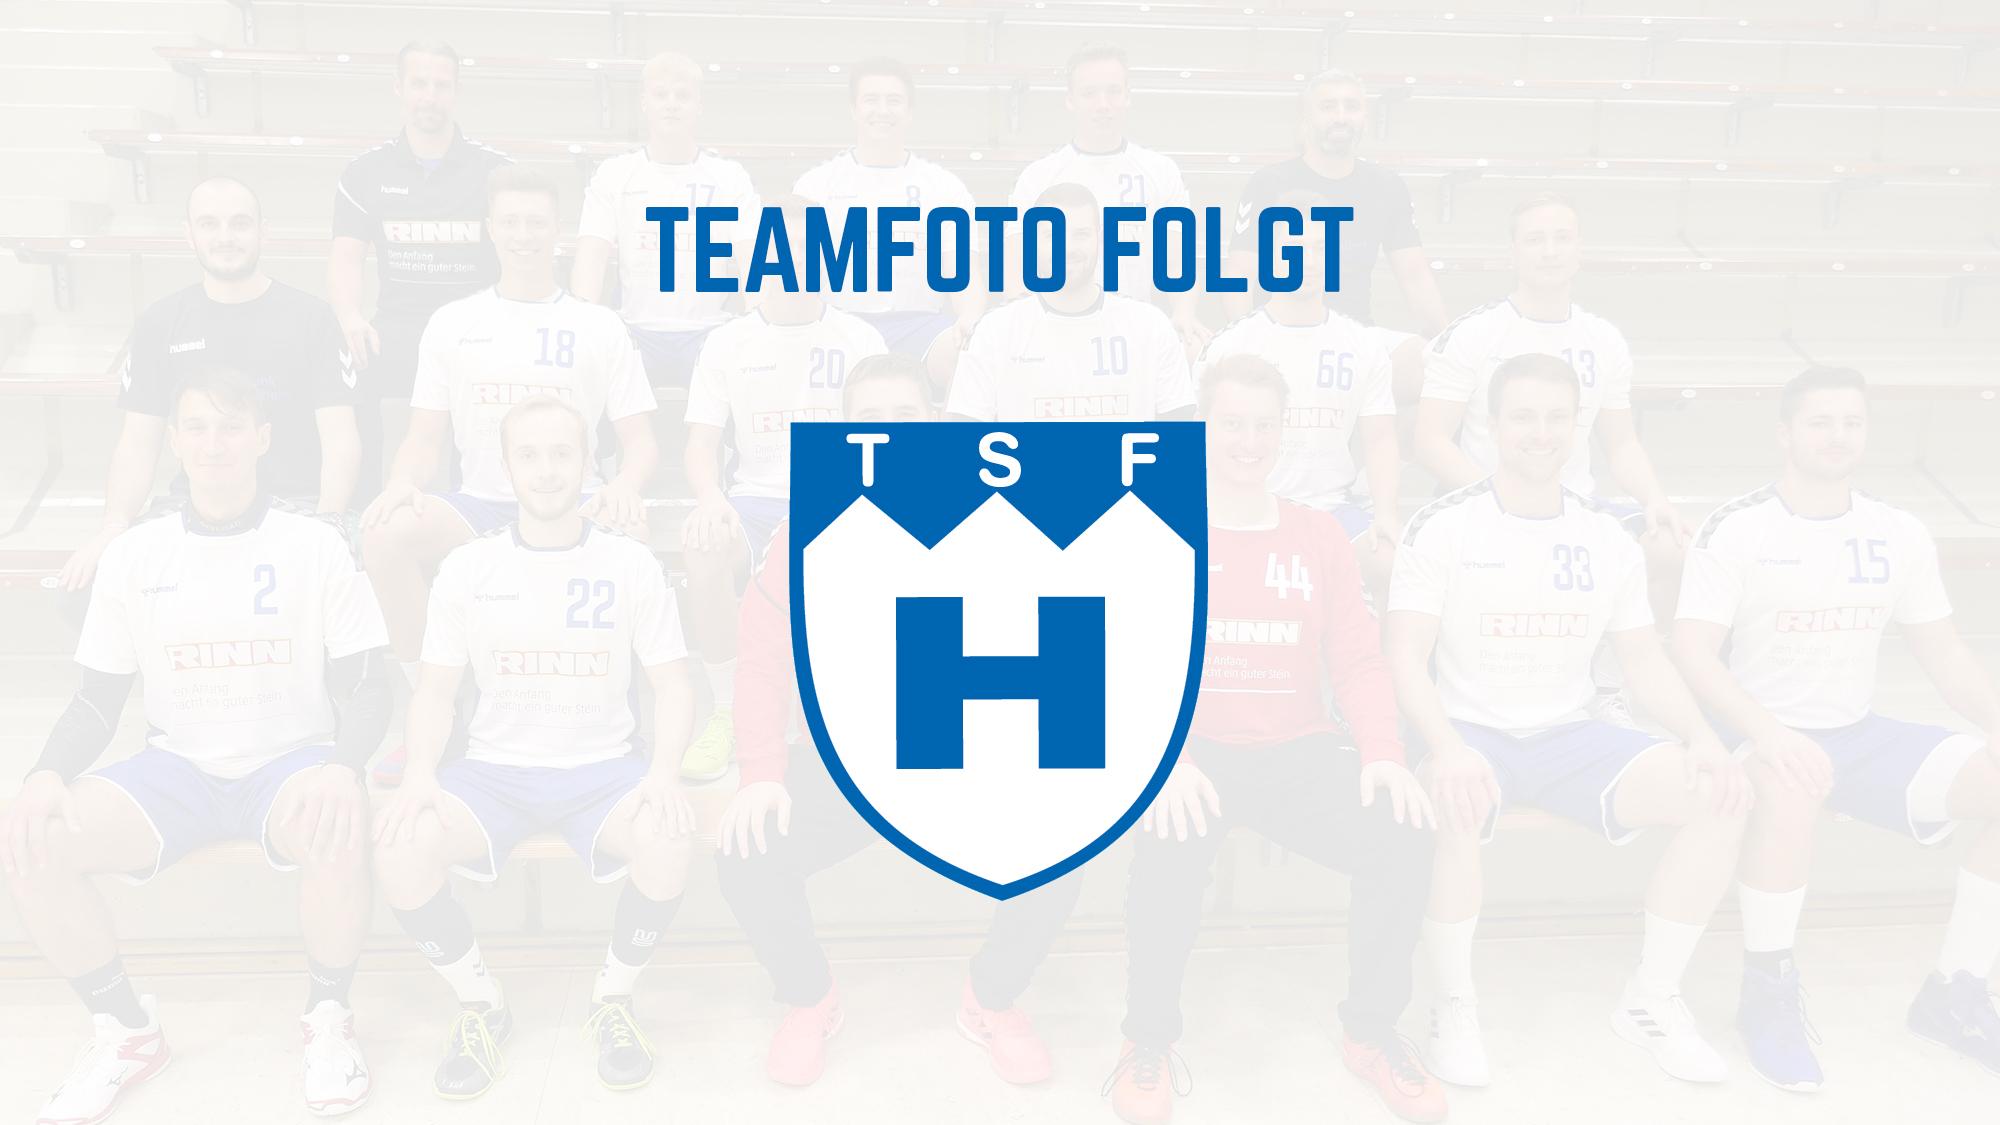 Teamfoto Leichtathletik Aktive